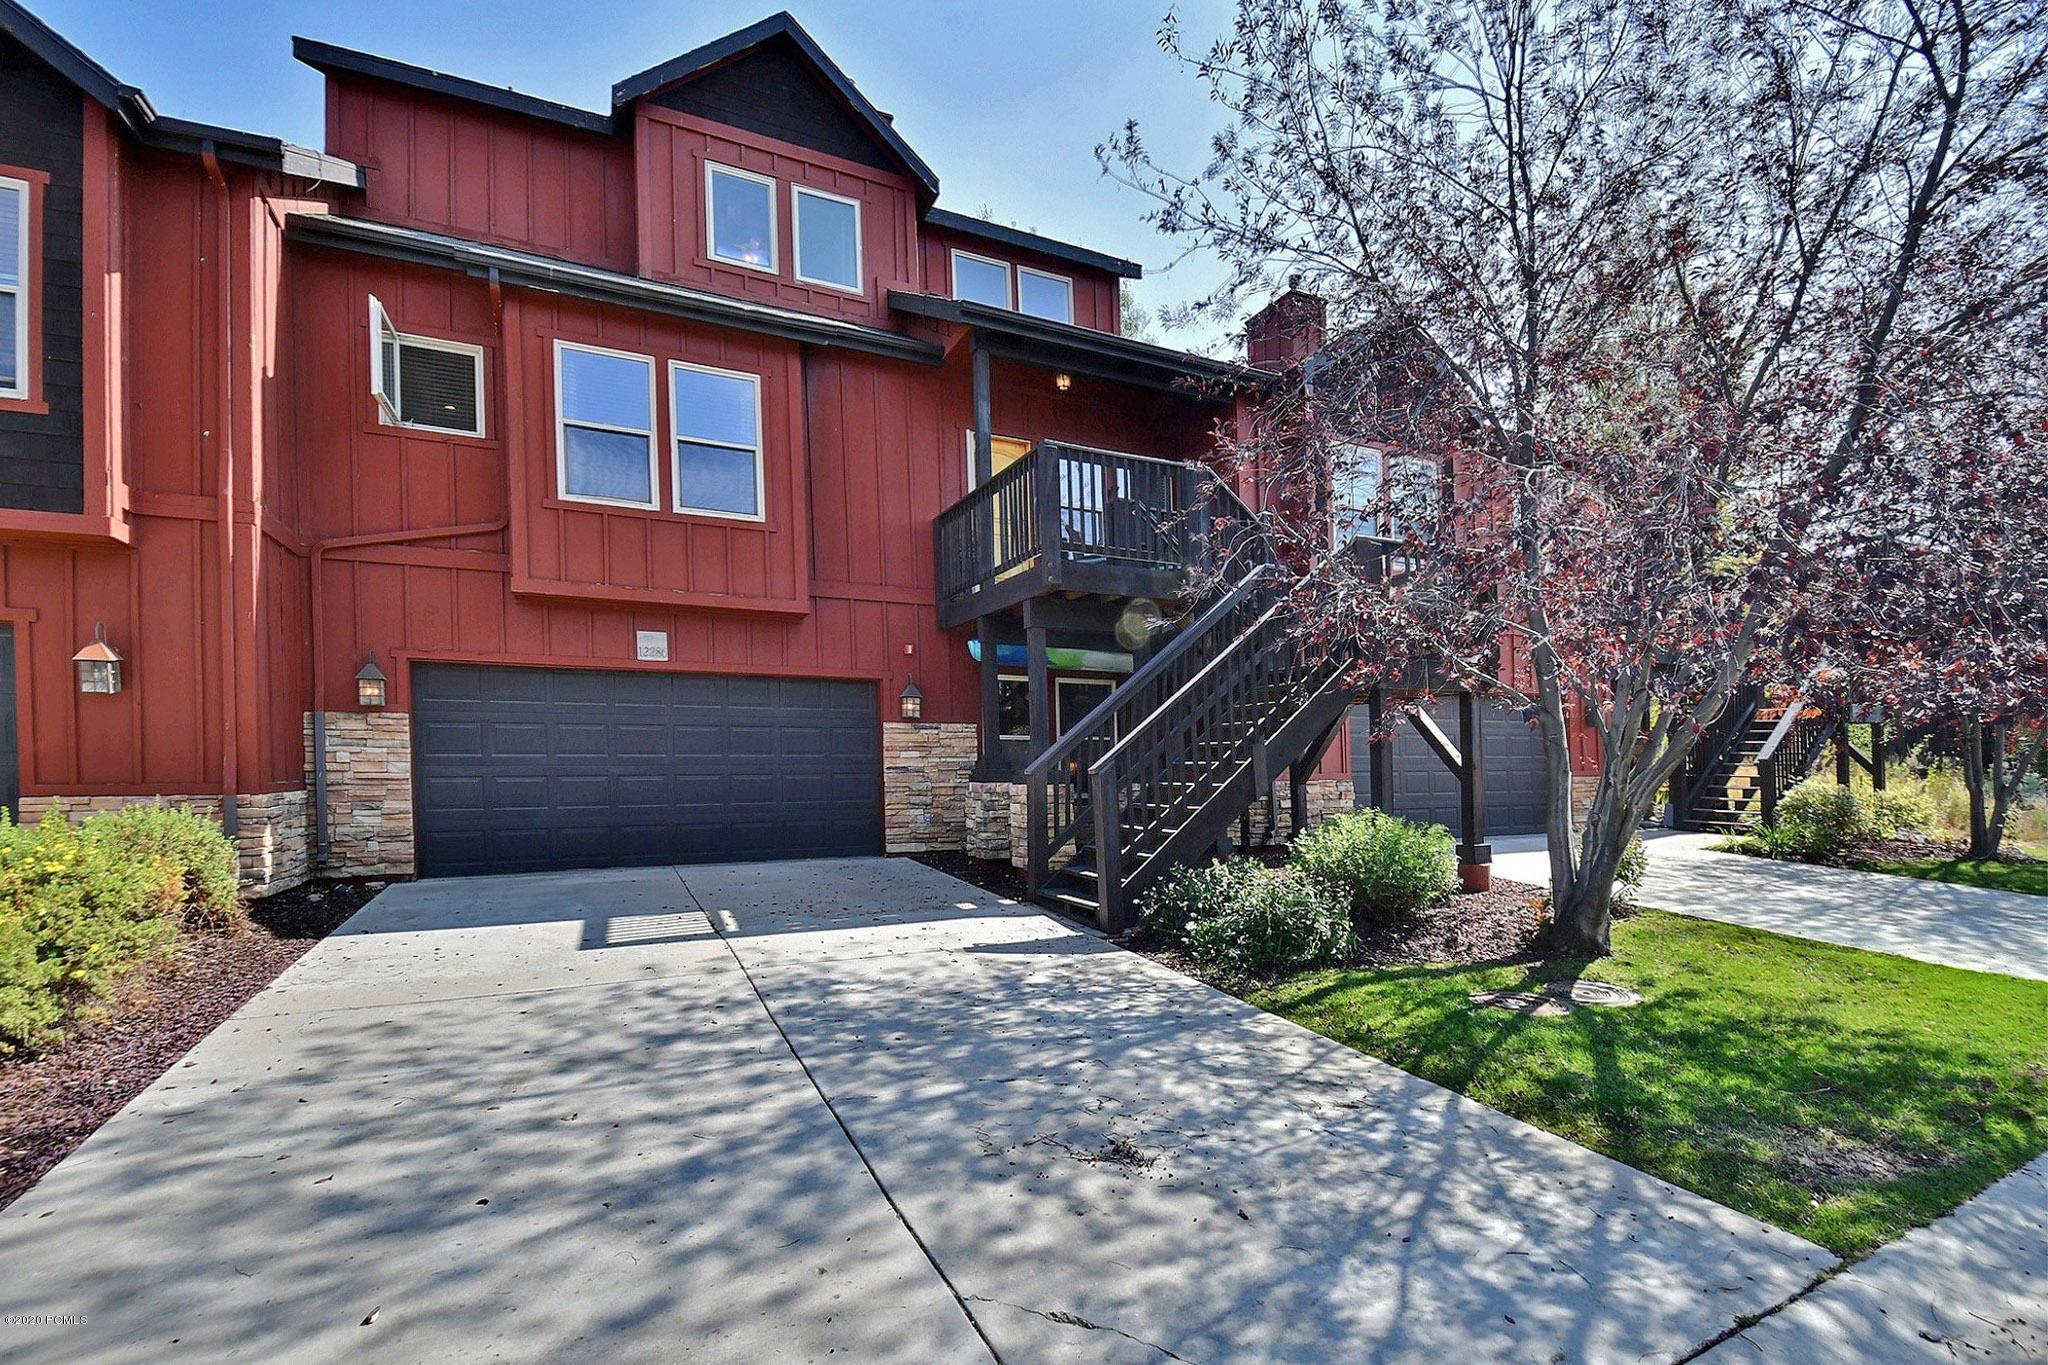 12286 Ross Creek Drive, Kamas, Utah 84036, 3 Bedrooms Bedrooms, ,3 BathroomsBathrooms,Condominium,For Sale,Ross Creek,12003707